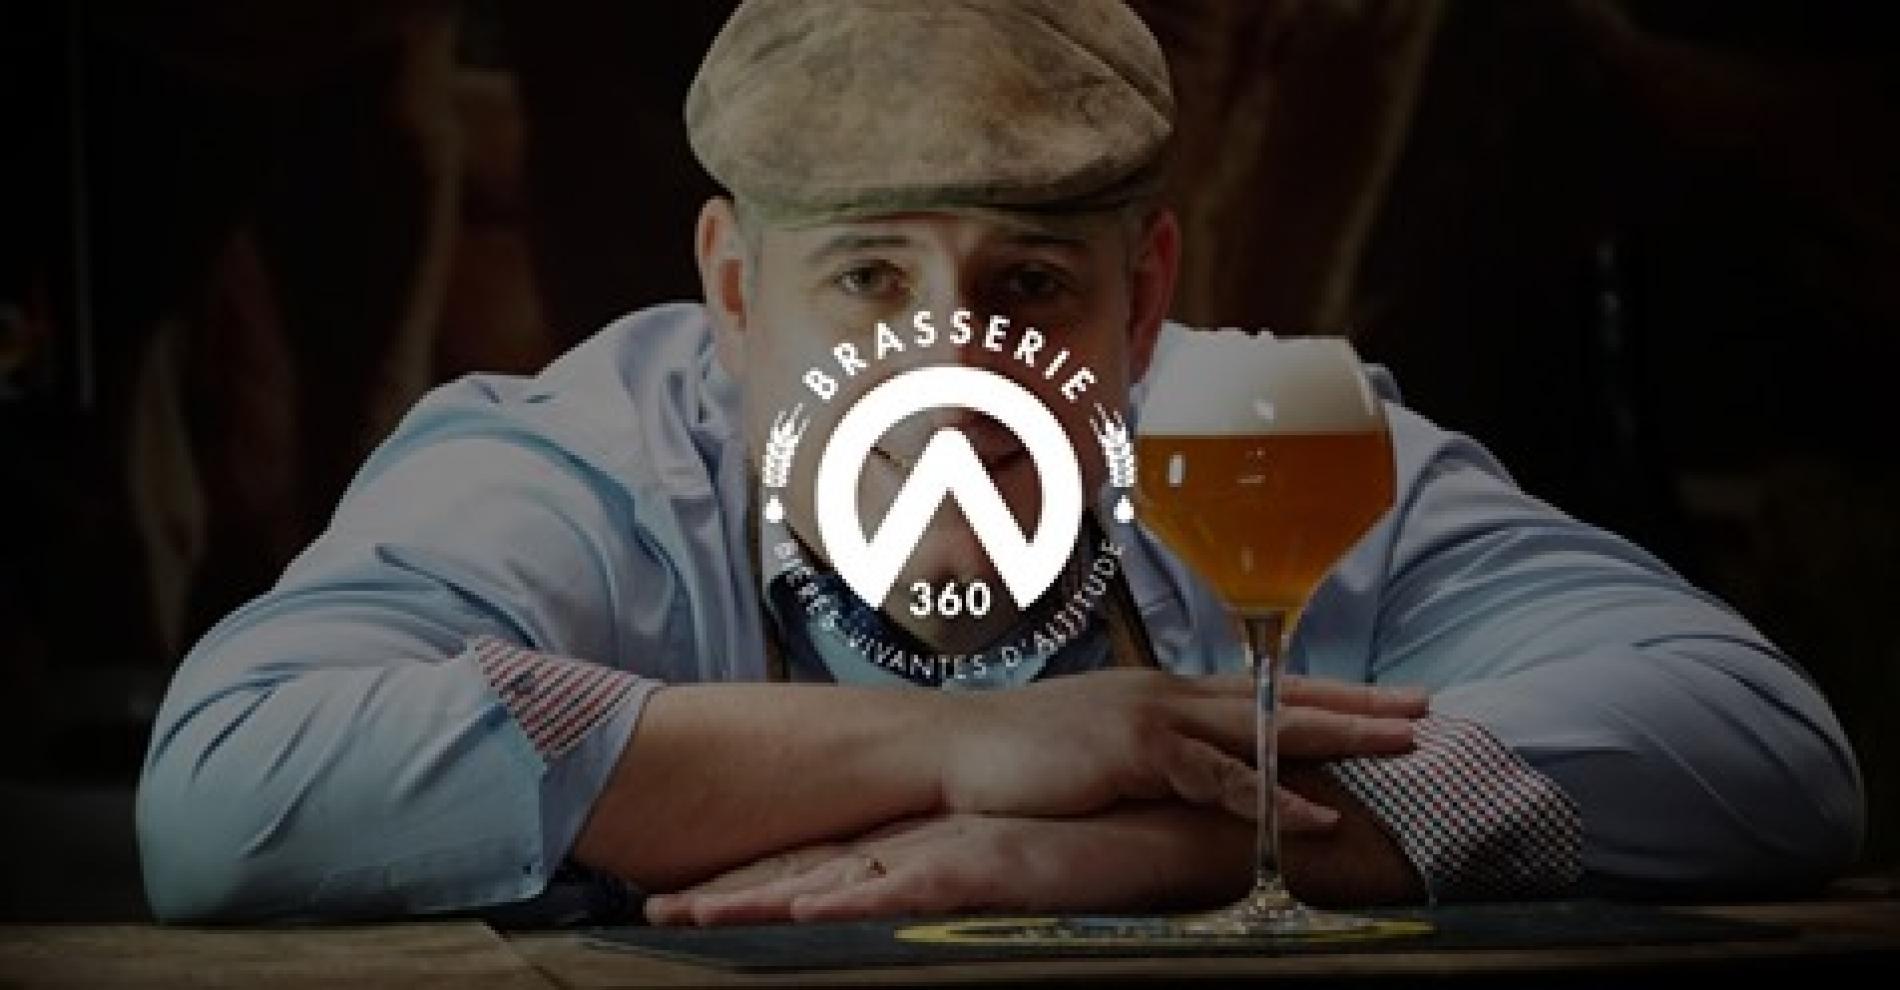 Brasserie 360°